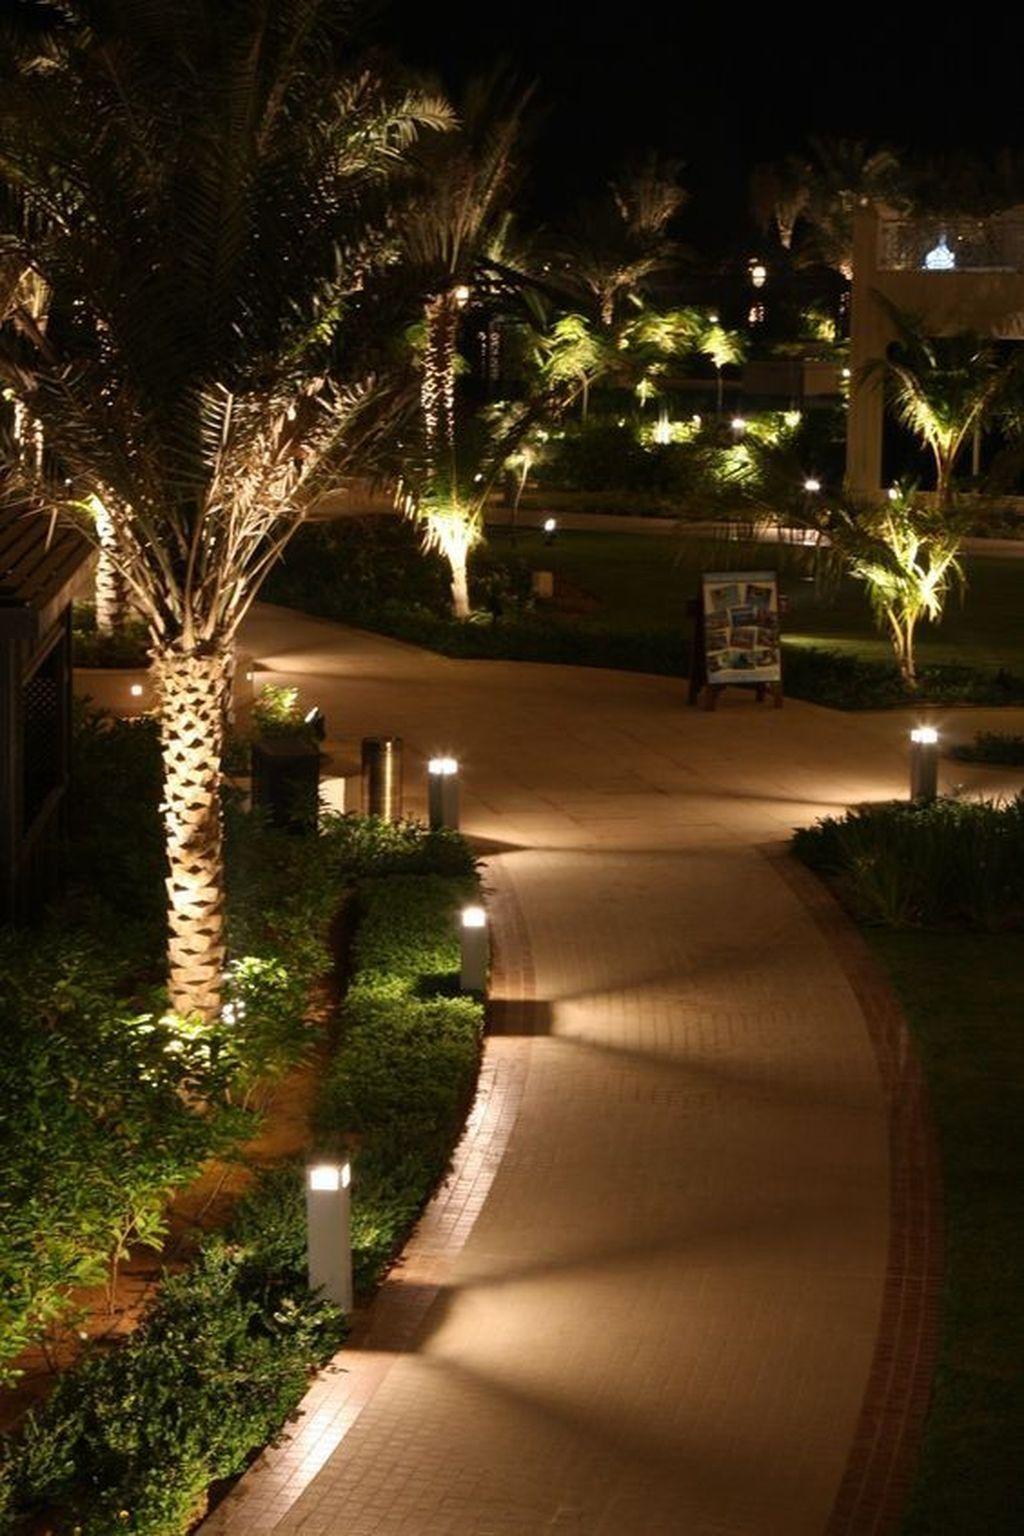 20 Beautiful Light Design Ideas For Garden In 2020 Outdoor Landscape Lighting Diy Outdoor Lighting Backyard Lighting